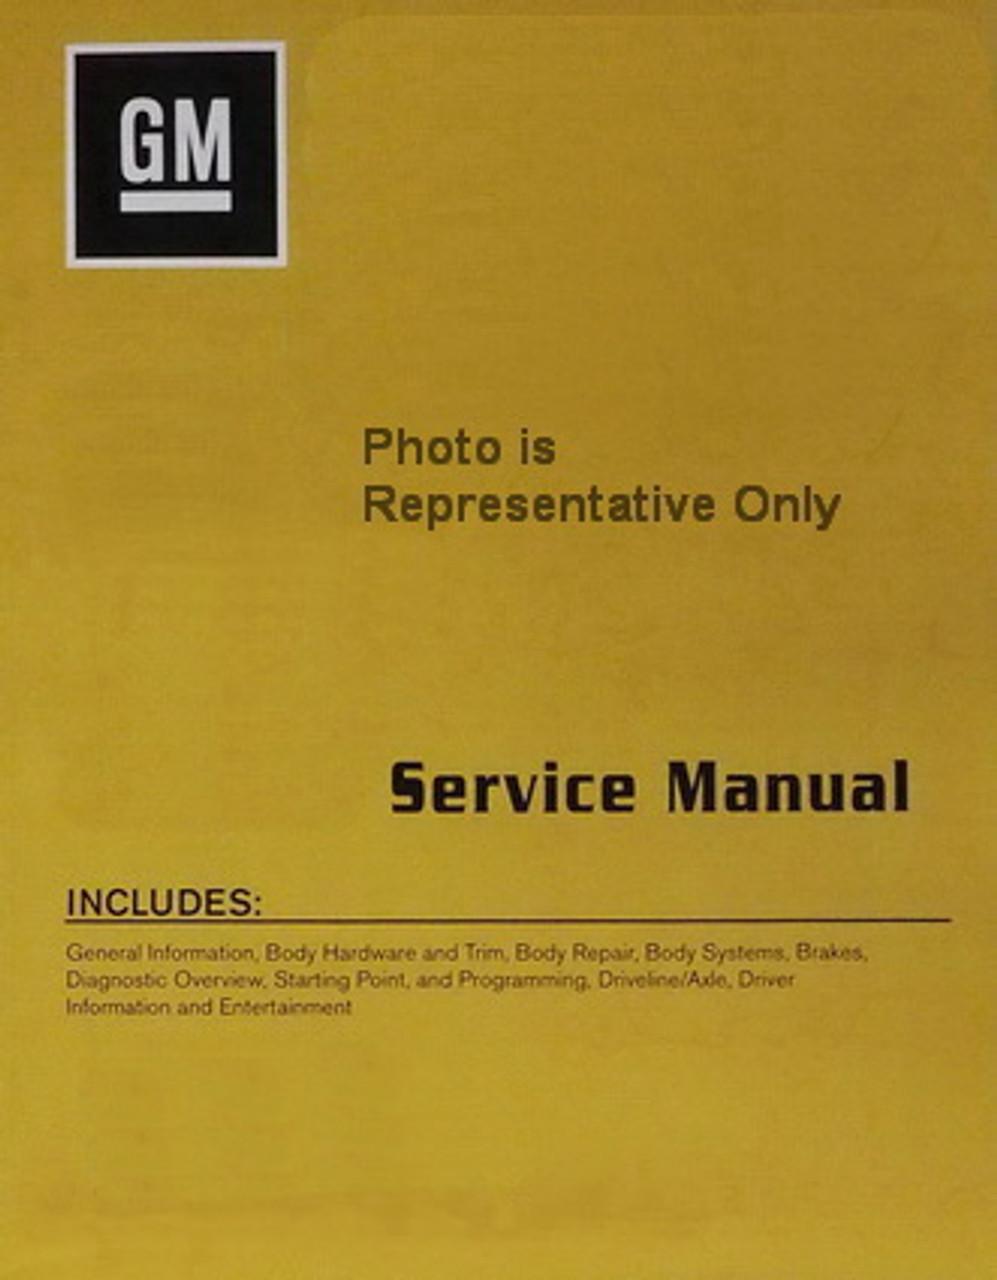 2015 Buick Regal Factory Service Manual Complete Set